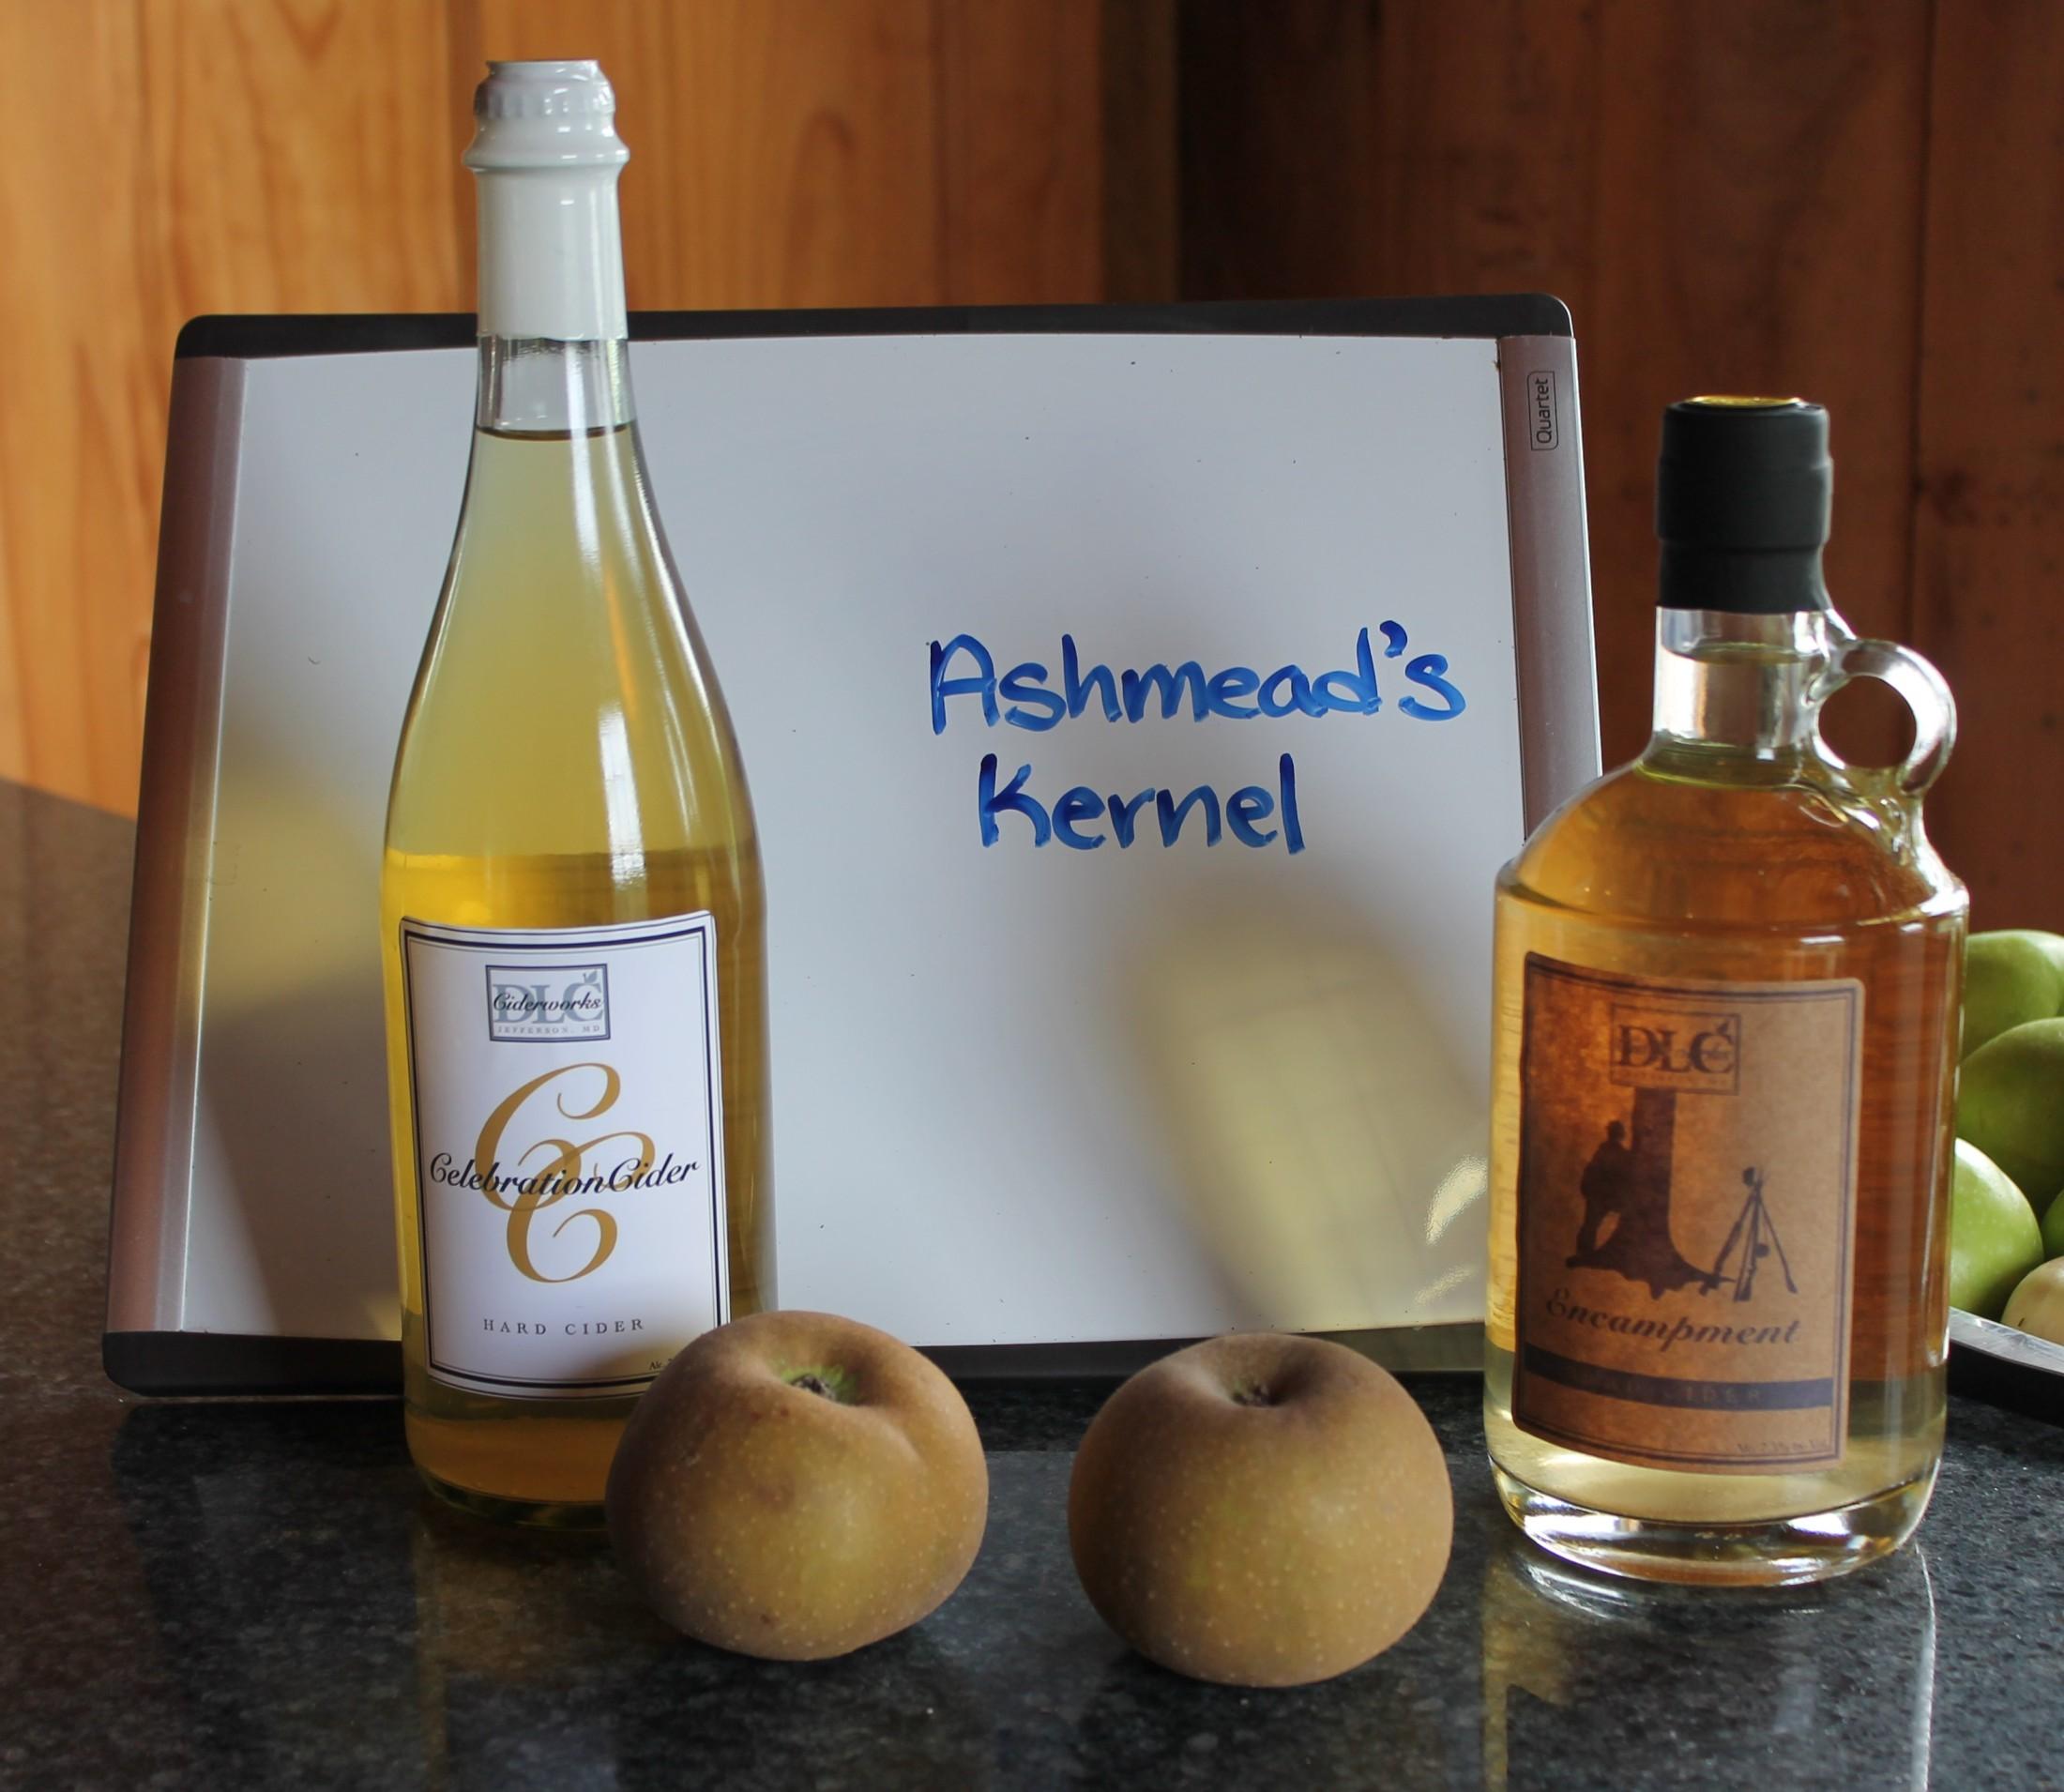 Ashmead's Kernel